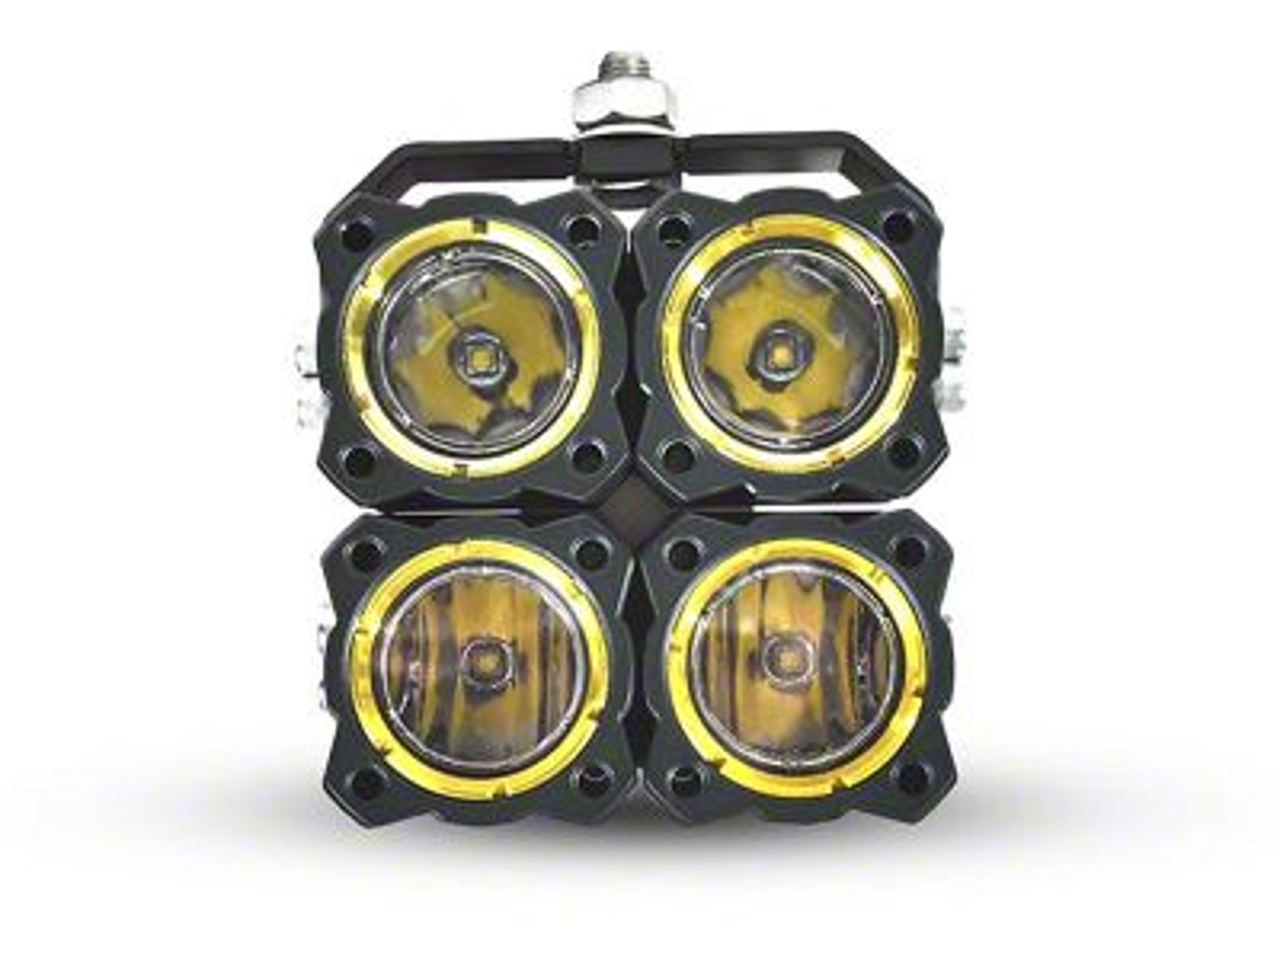 KC HiLiTES Flex Quad LED Light Combo - Spot & Spread Beam